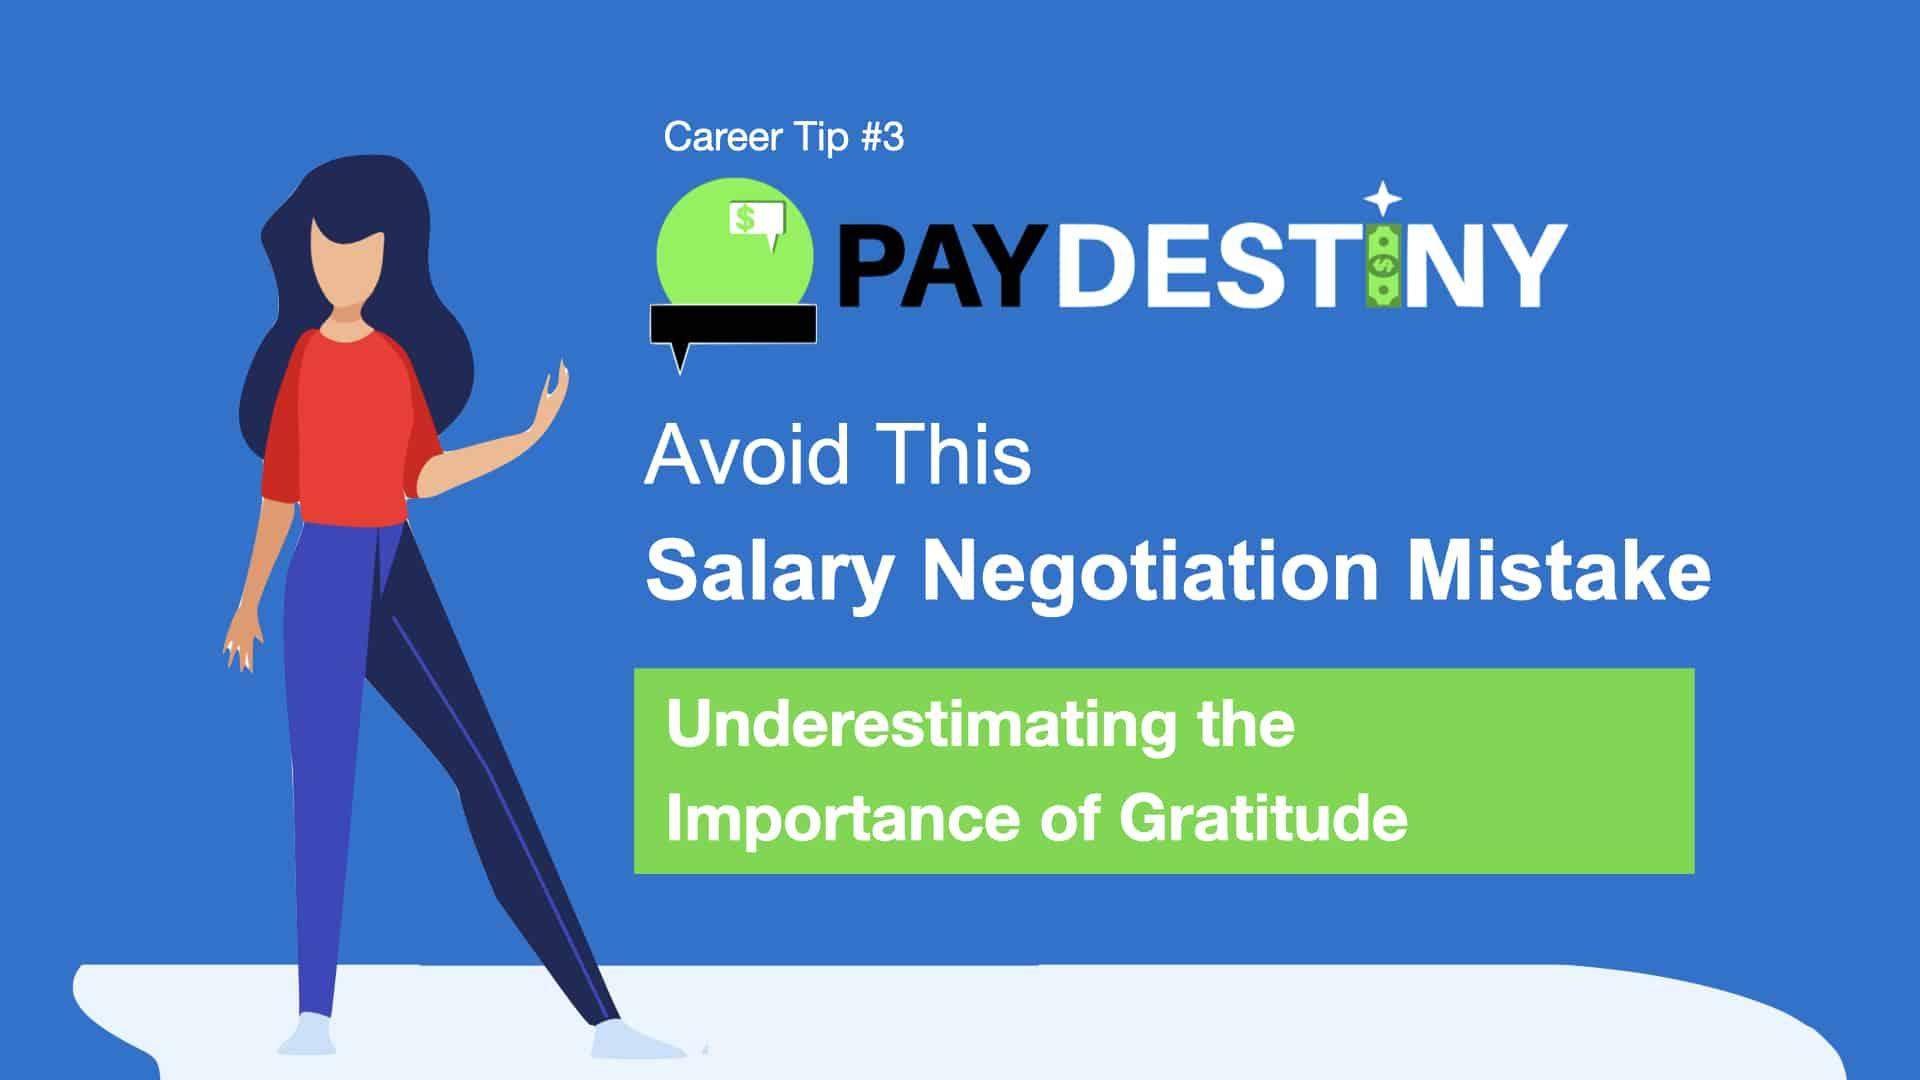 Salary Negotiation Mistake (Underestimating the Importance of Gratitude)